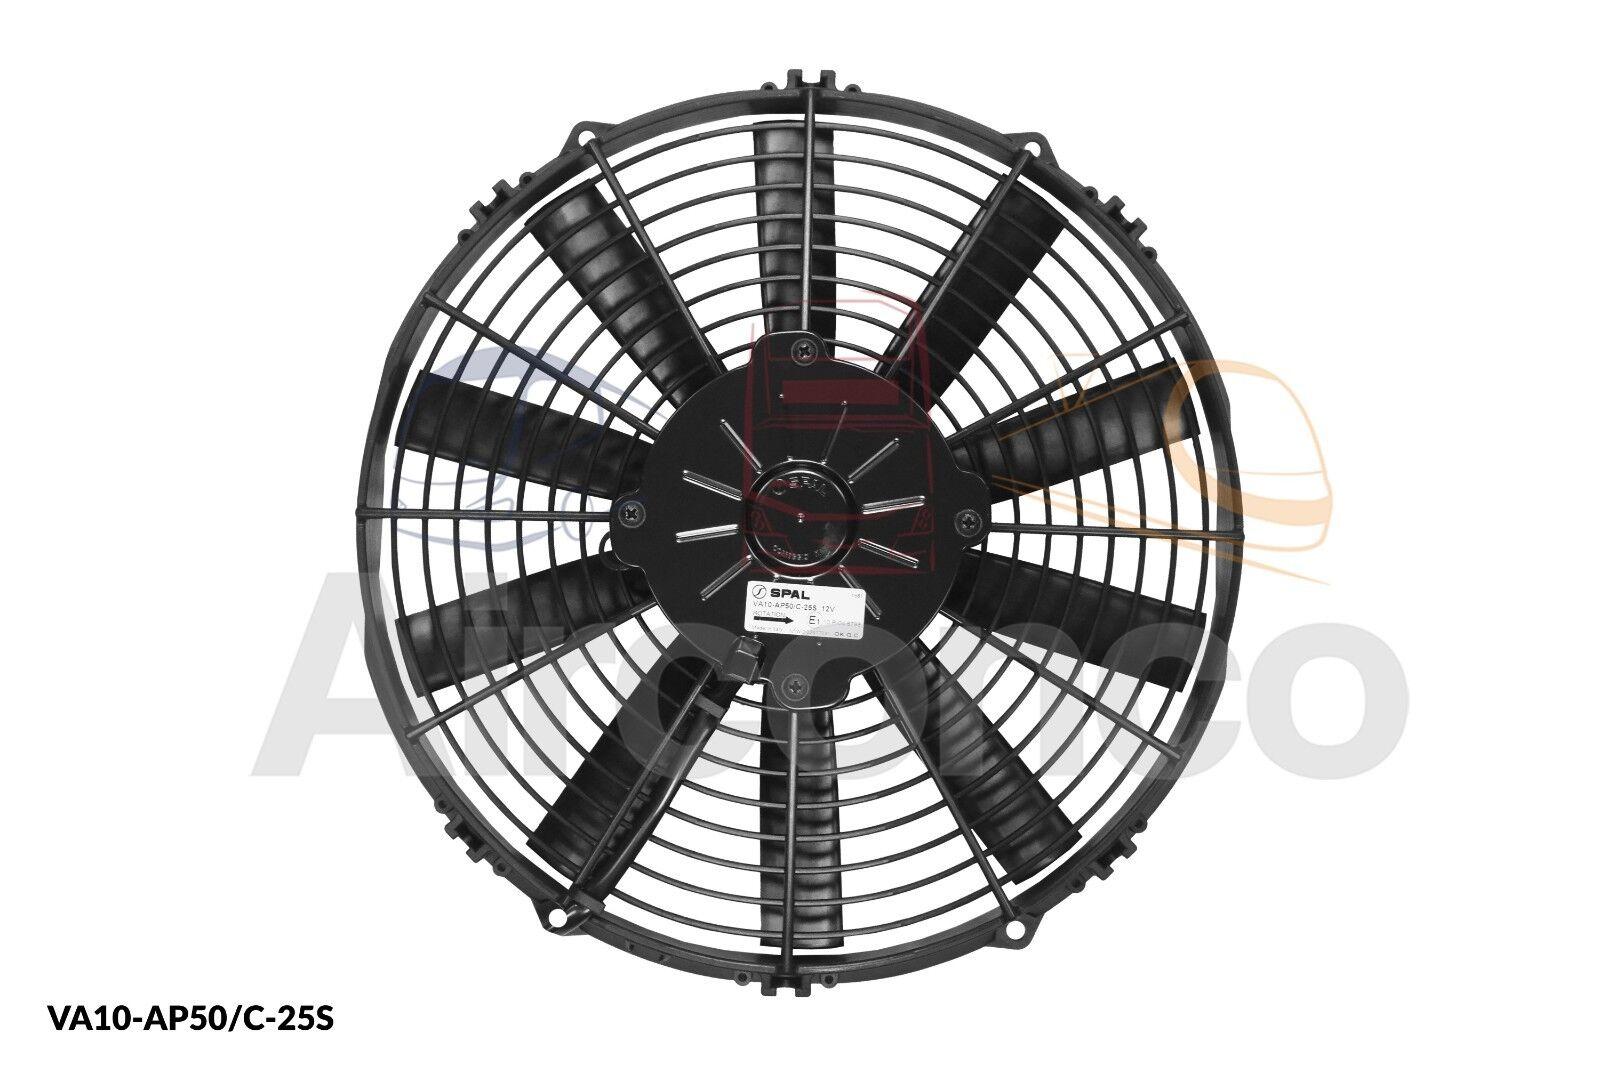 VA10-AP50//C-25S 12v Push - Genuine Product! Spal Axial Fan